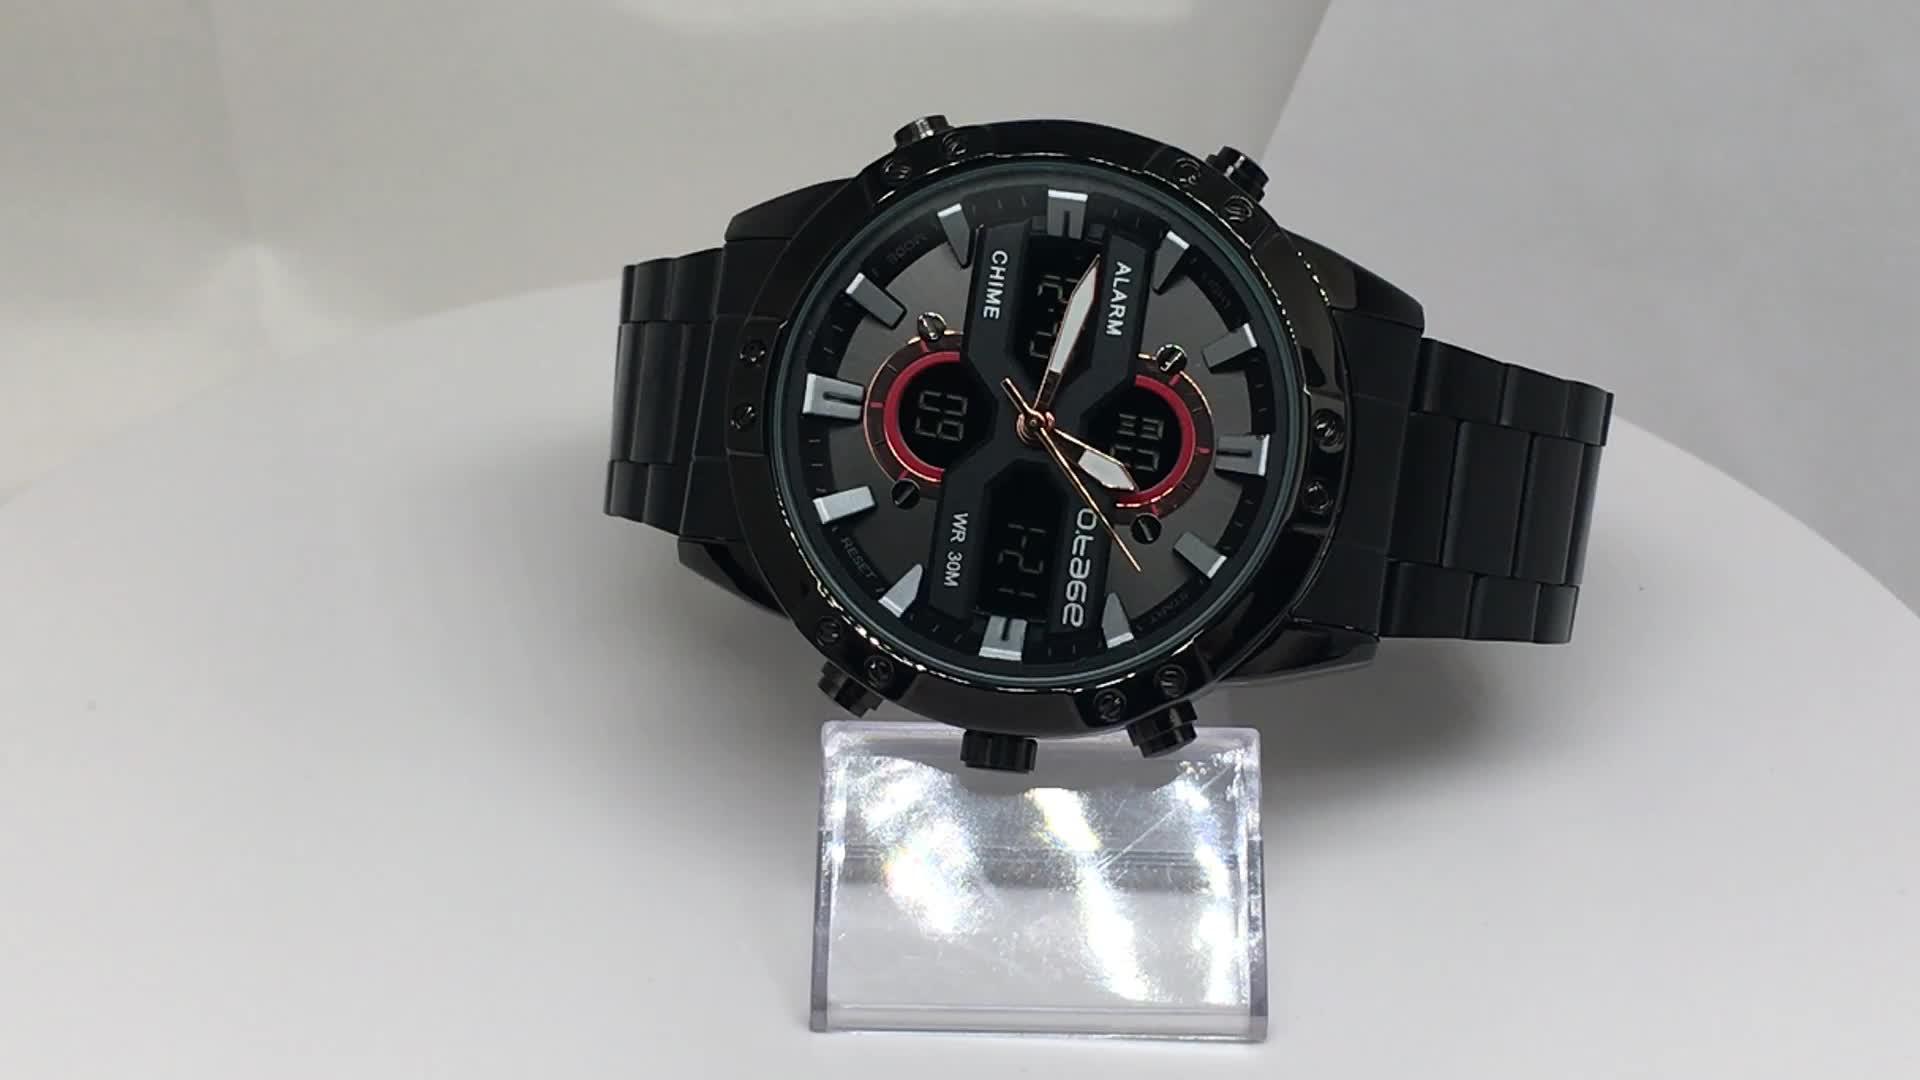 Relógios homens de pulso de quartzo relogio masculino relógio de pulso de moda minimalista de luxo banda de aço inoxidável atacado